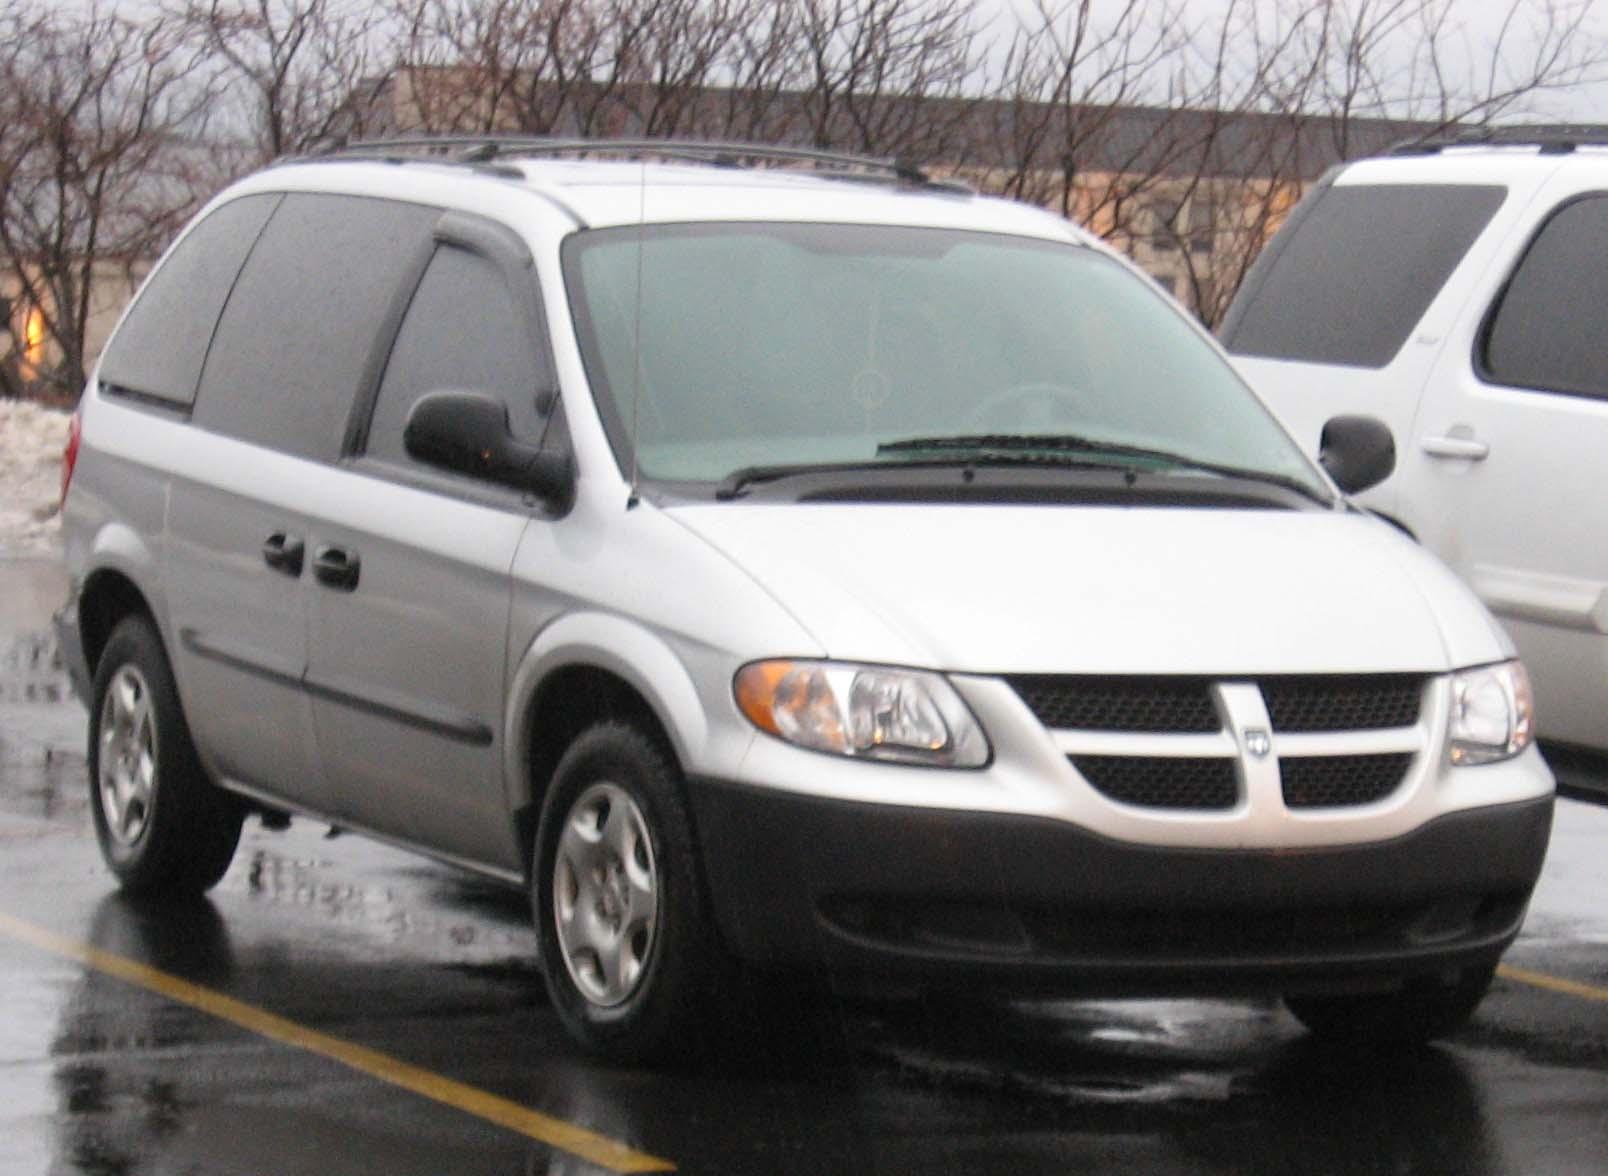 2001 Dodge Caravan - Information And Photos